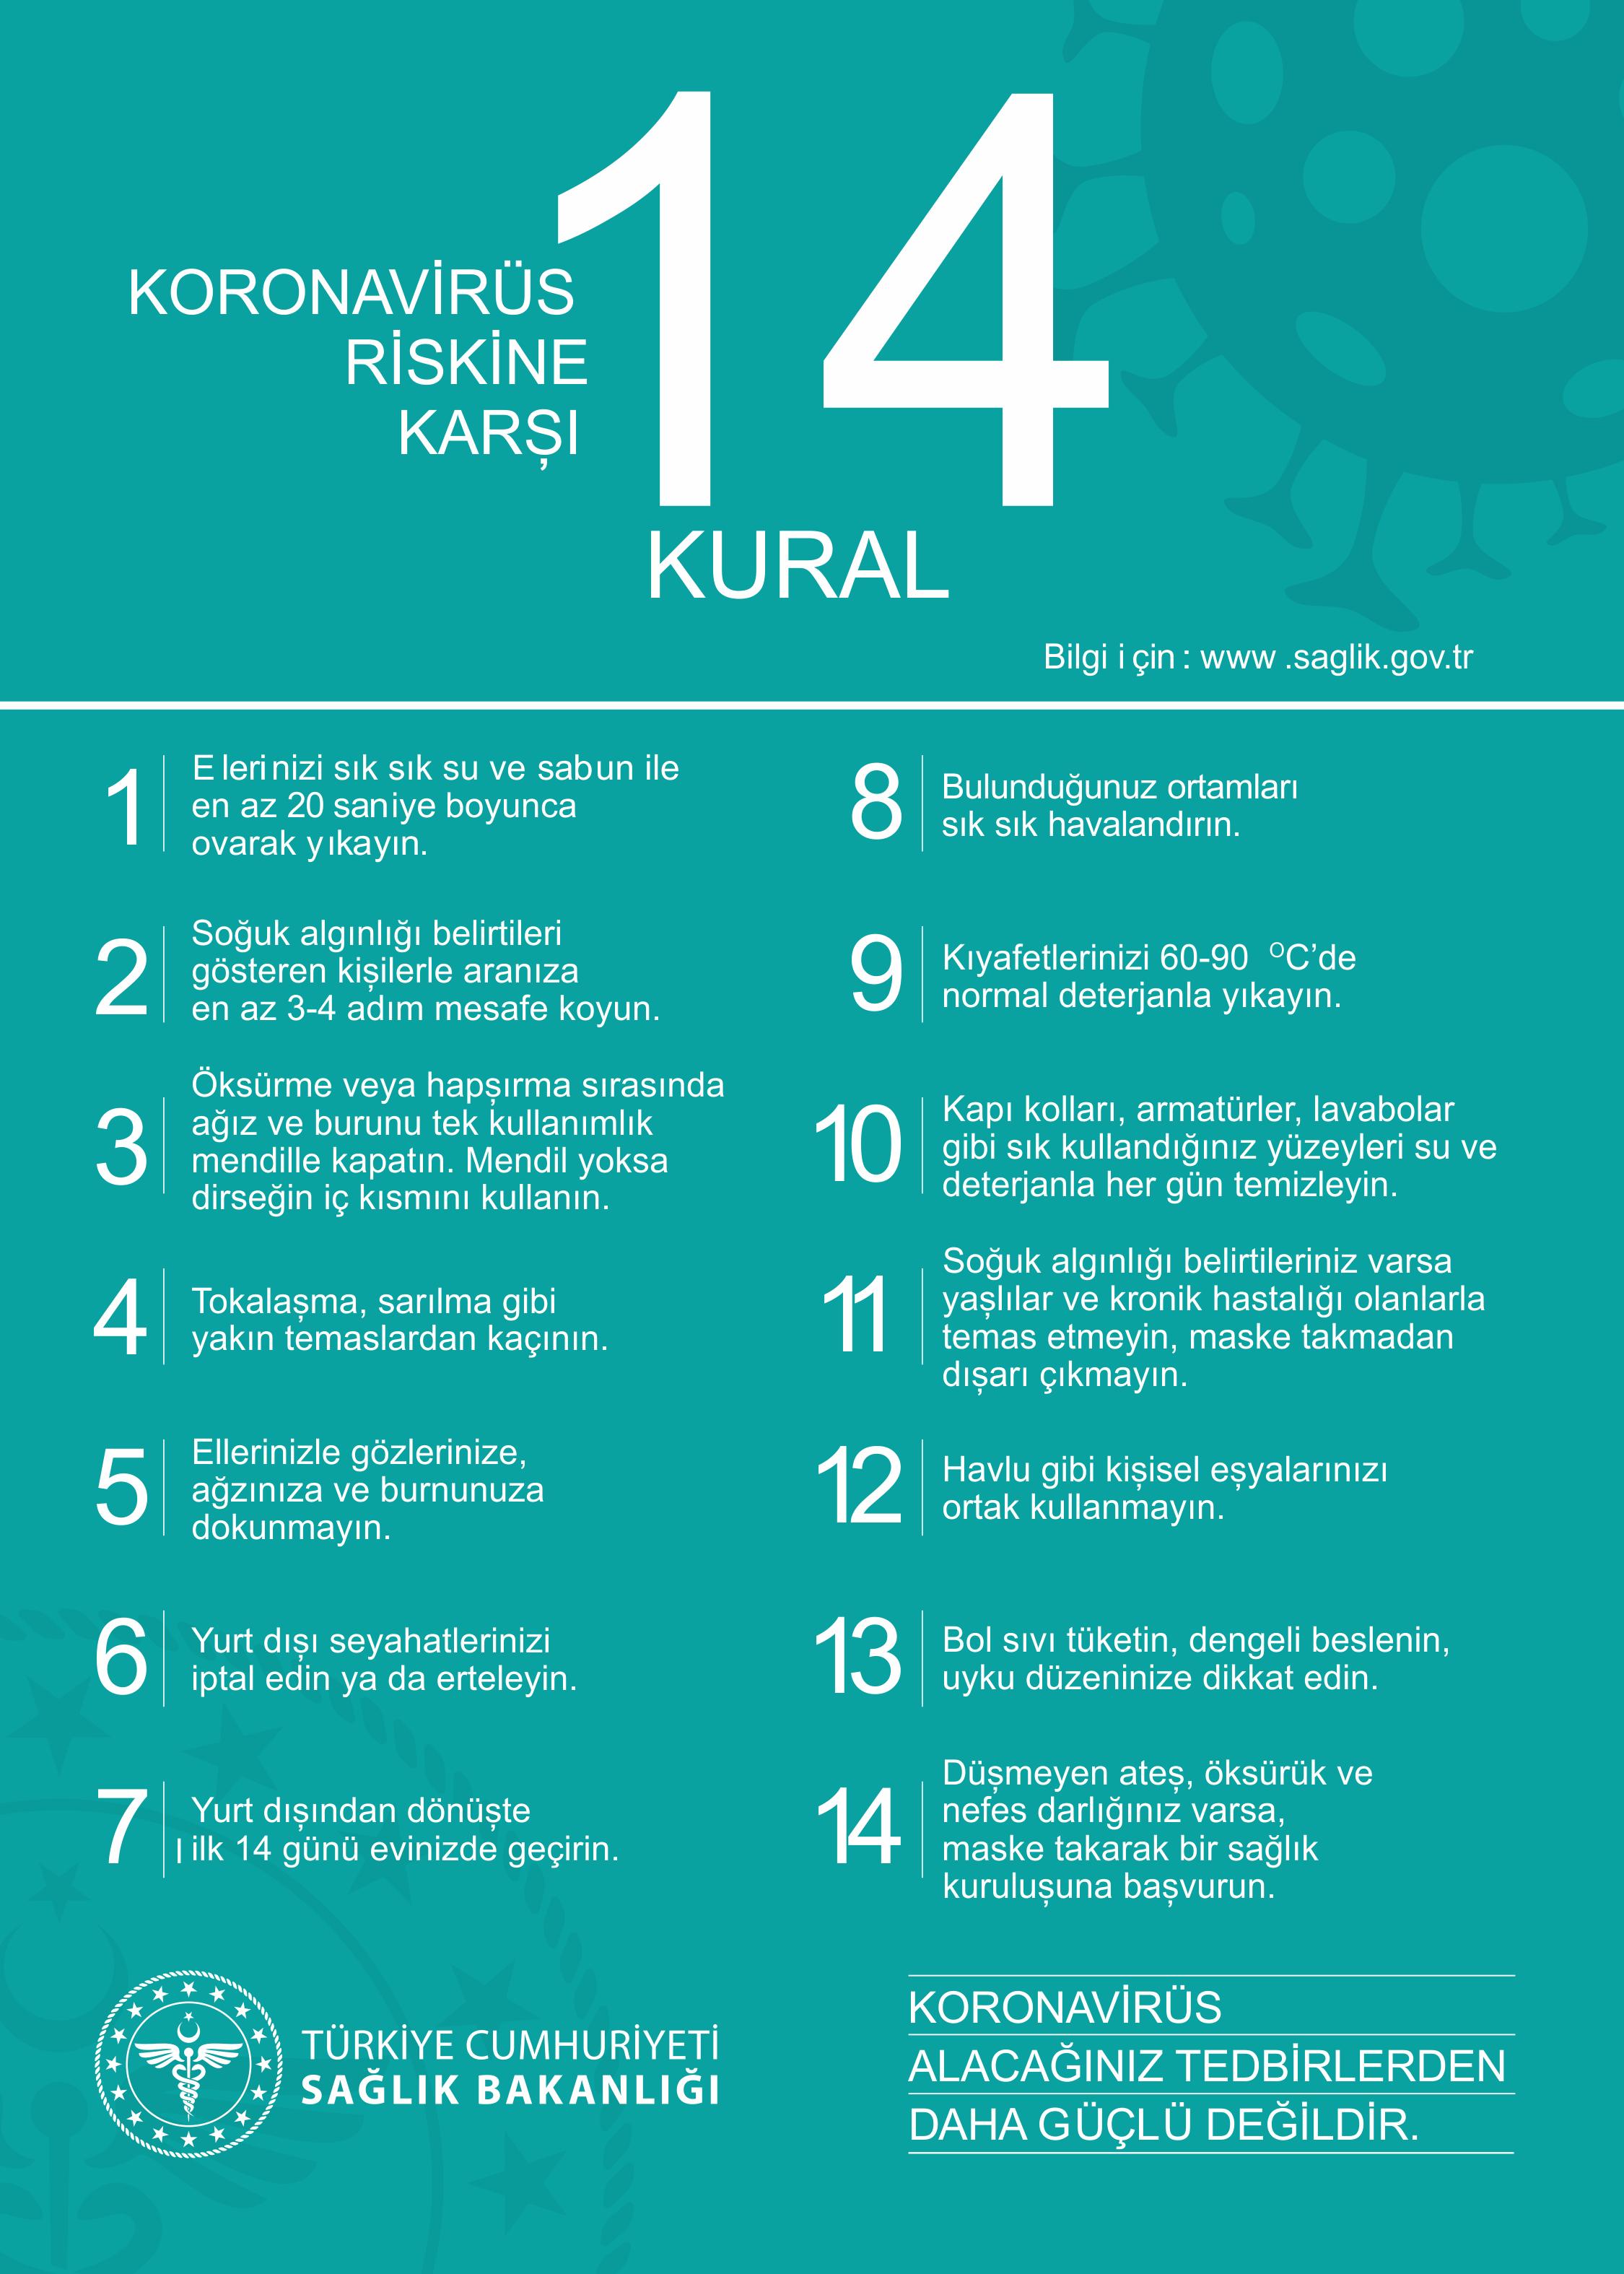 14-kural-corona-virüs